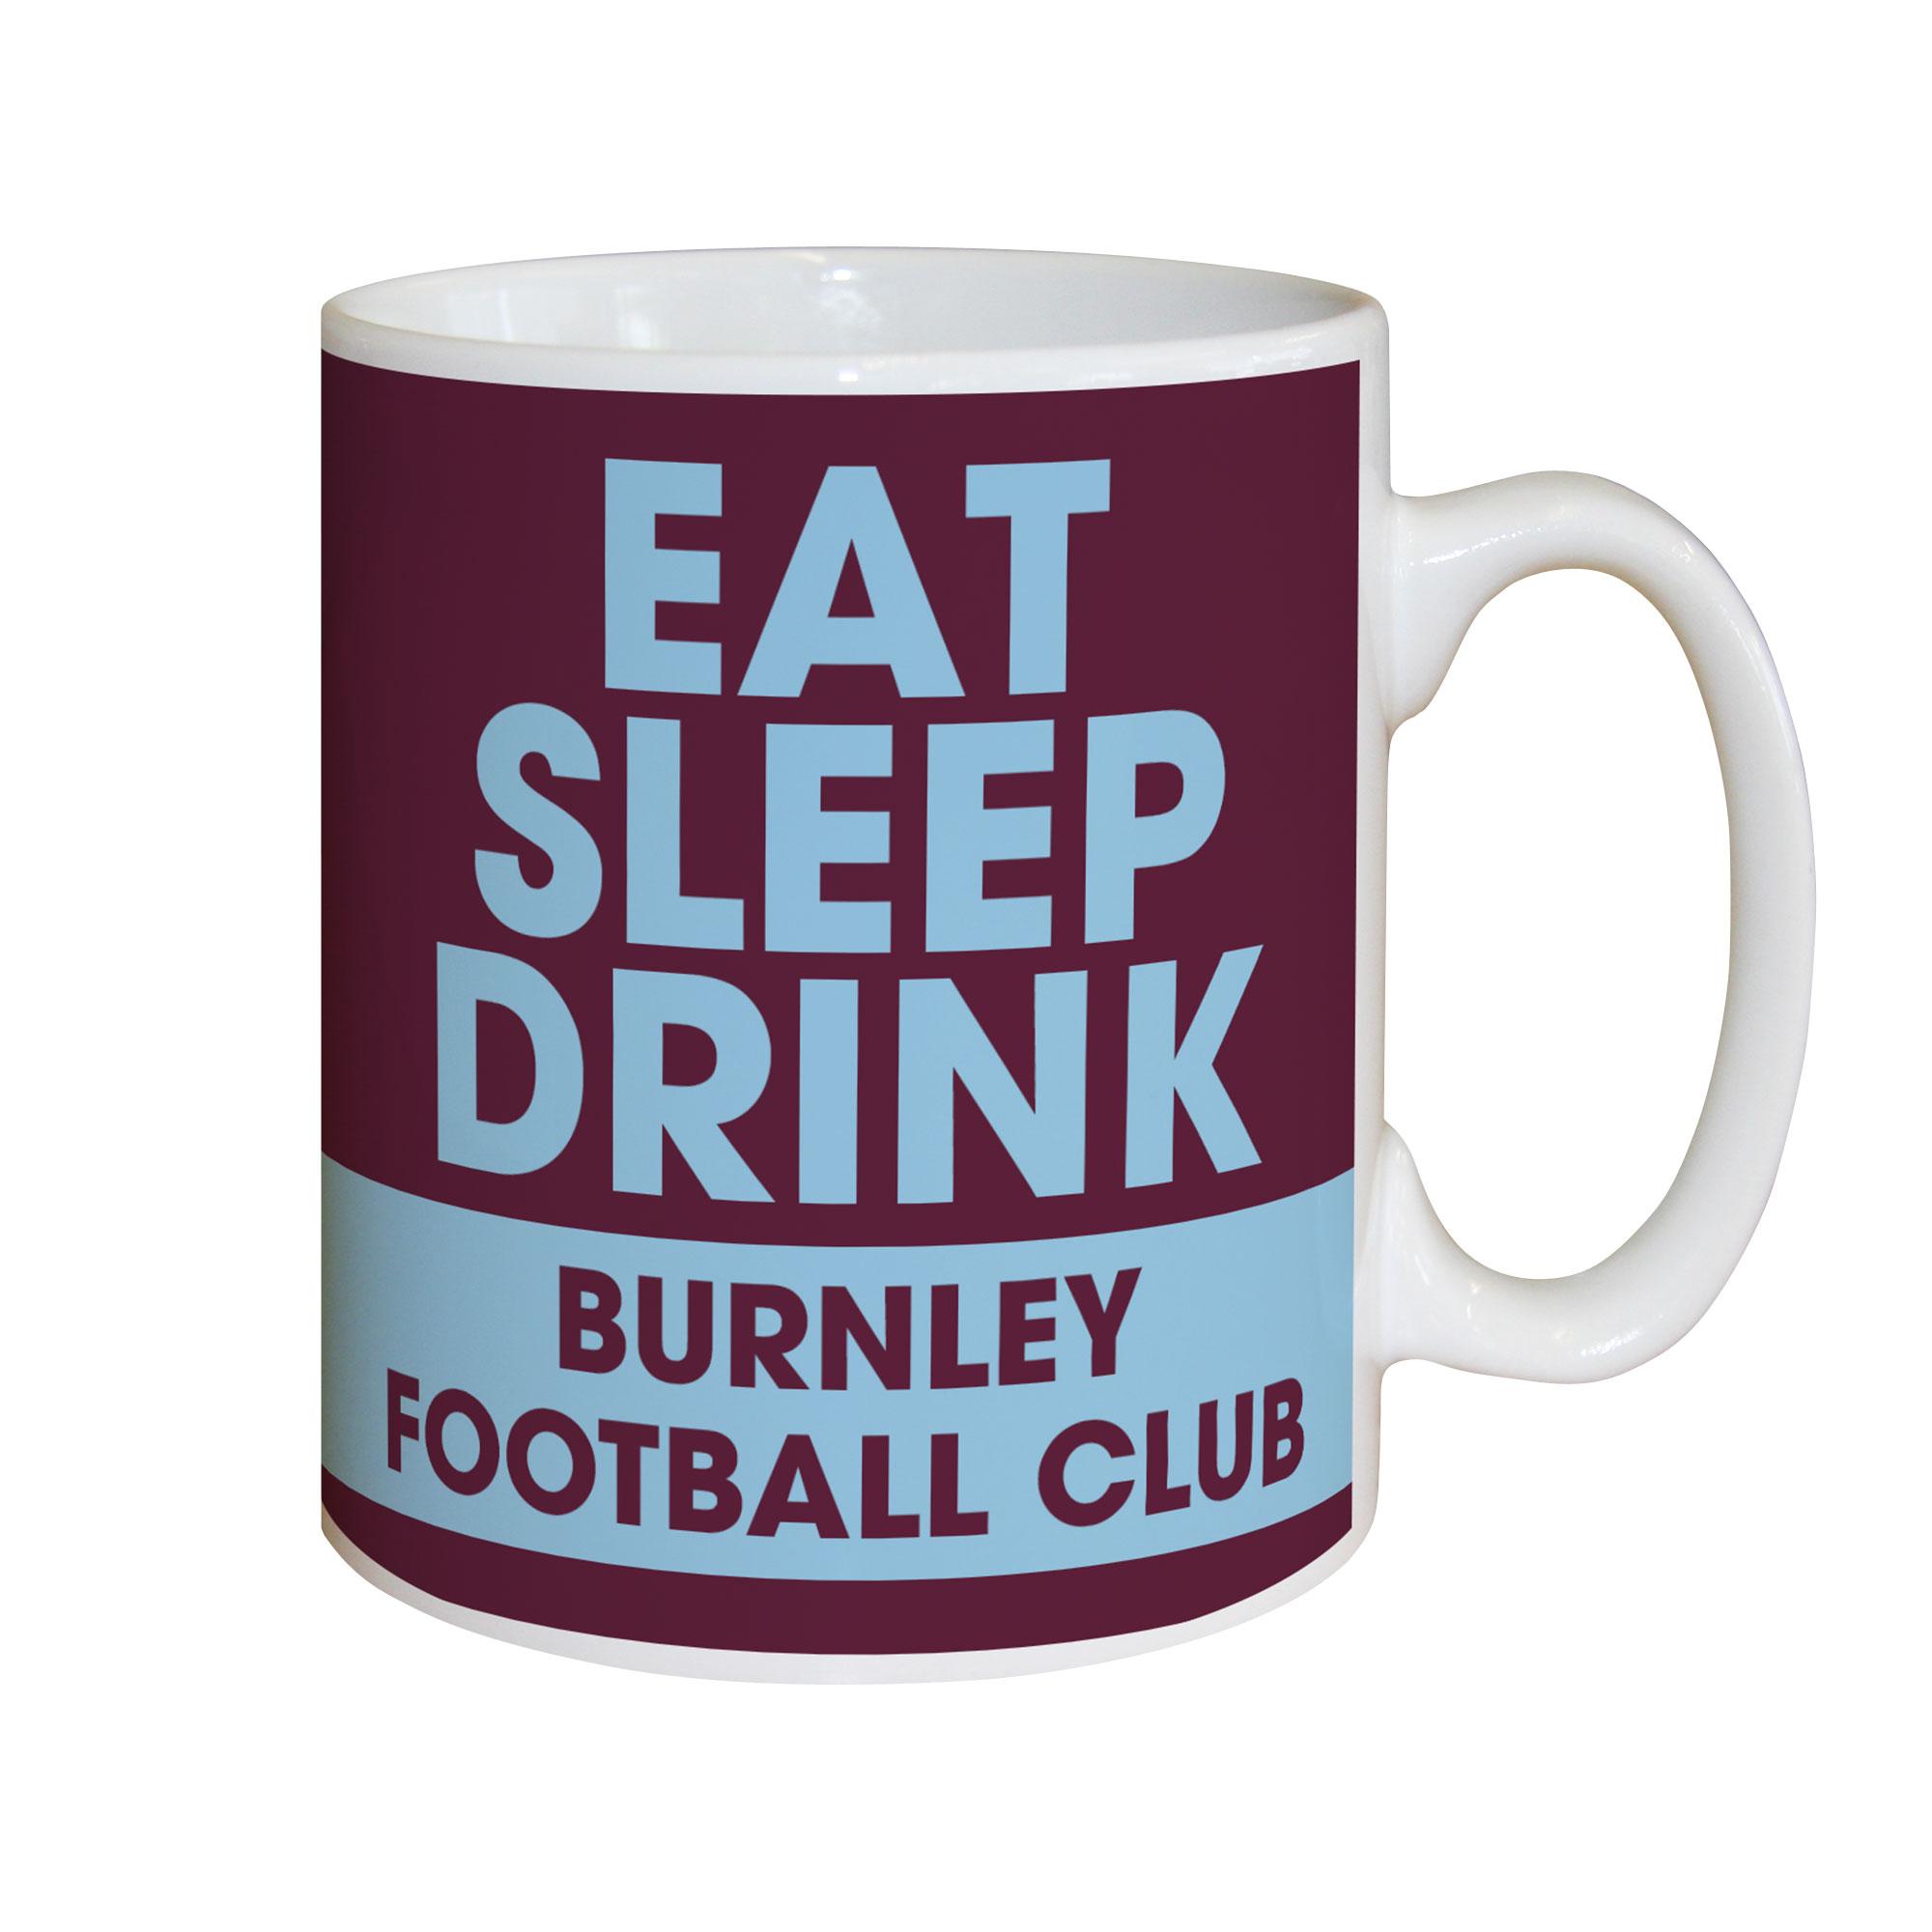 Burnley FC Eat Sleep Drink Mug